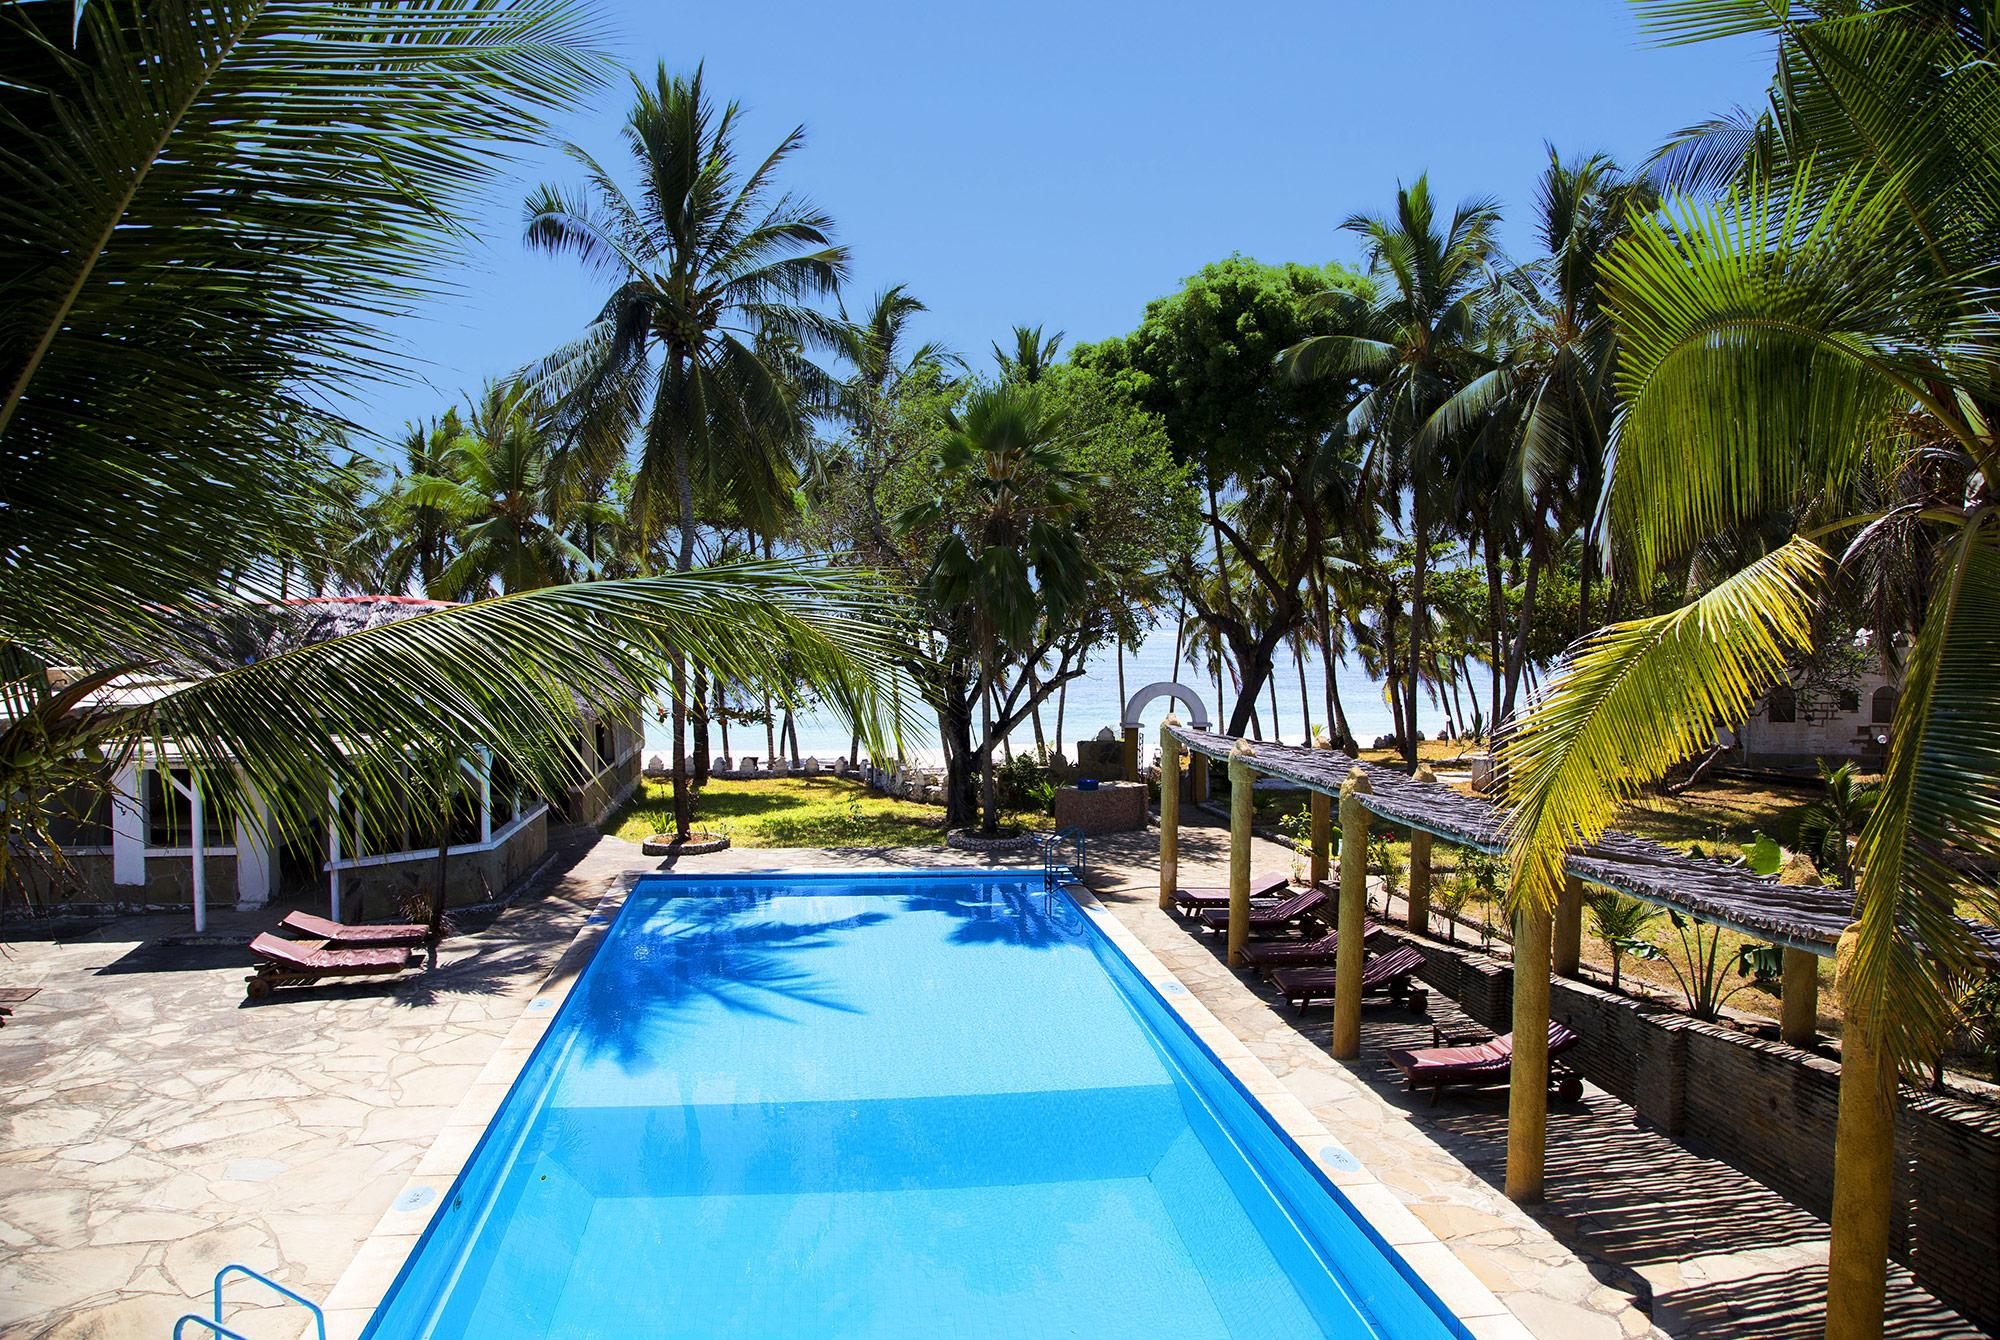 KEN_2019_6FWI_Coconut-Beach_OCO1746_2000